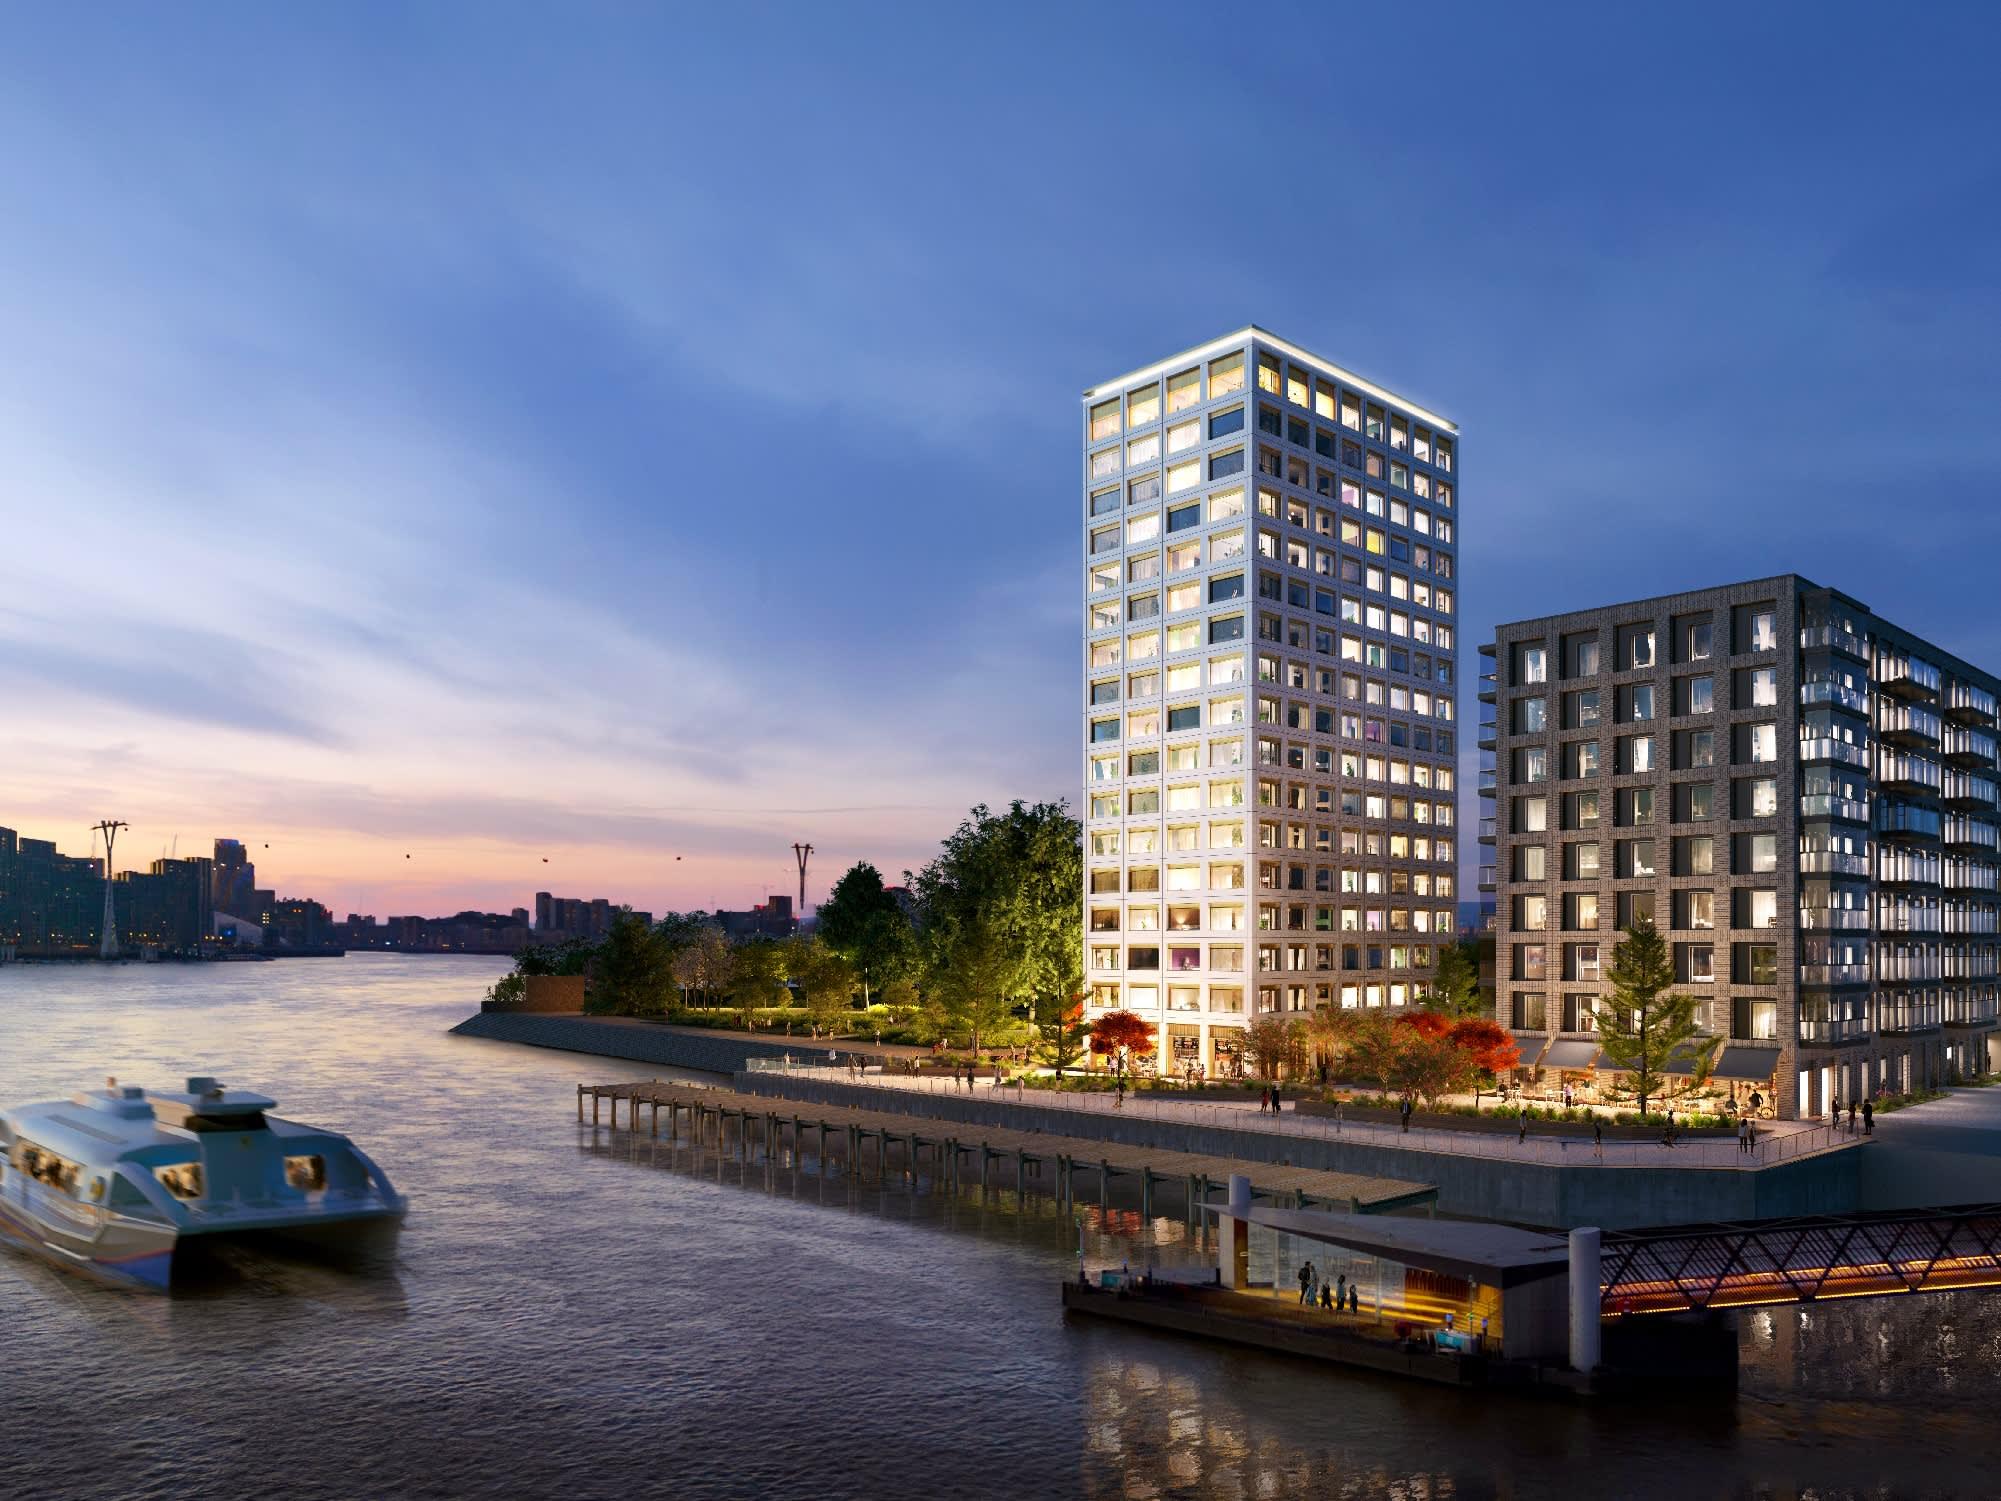 Riverscape London VIP线下贵宾独家预览